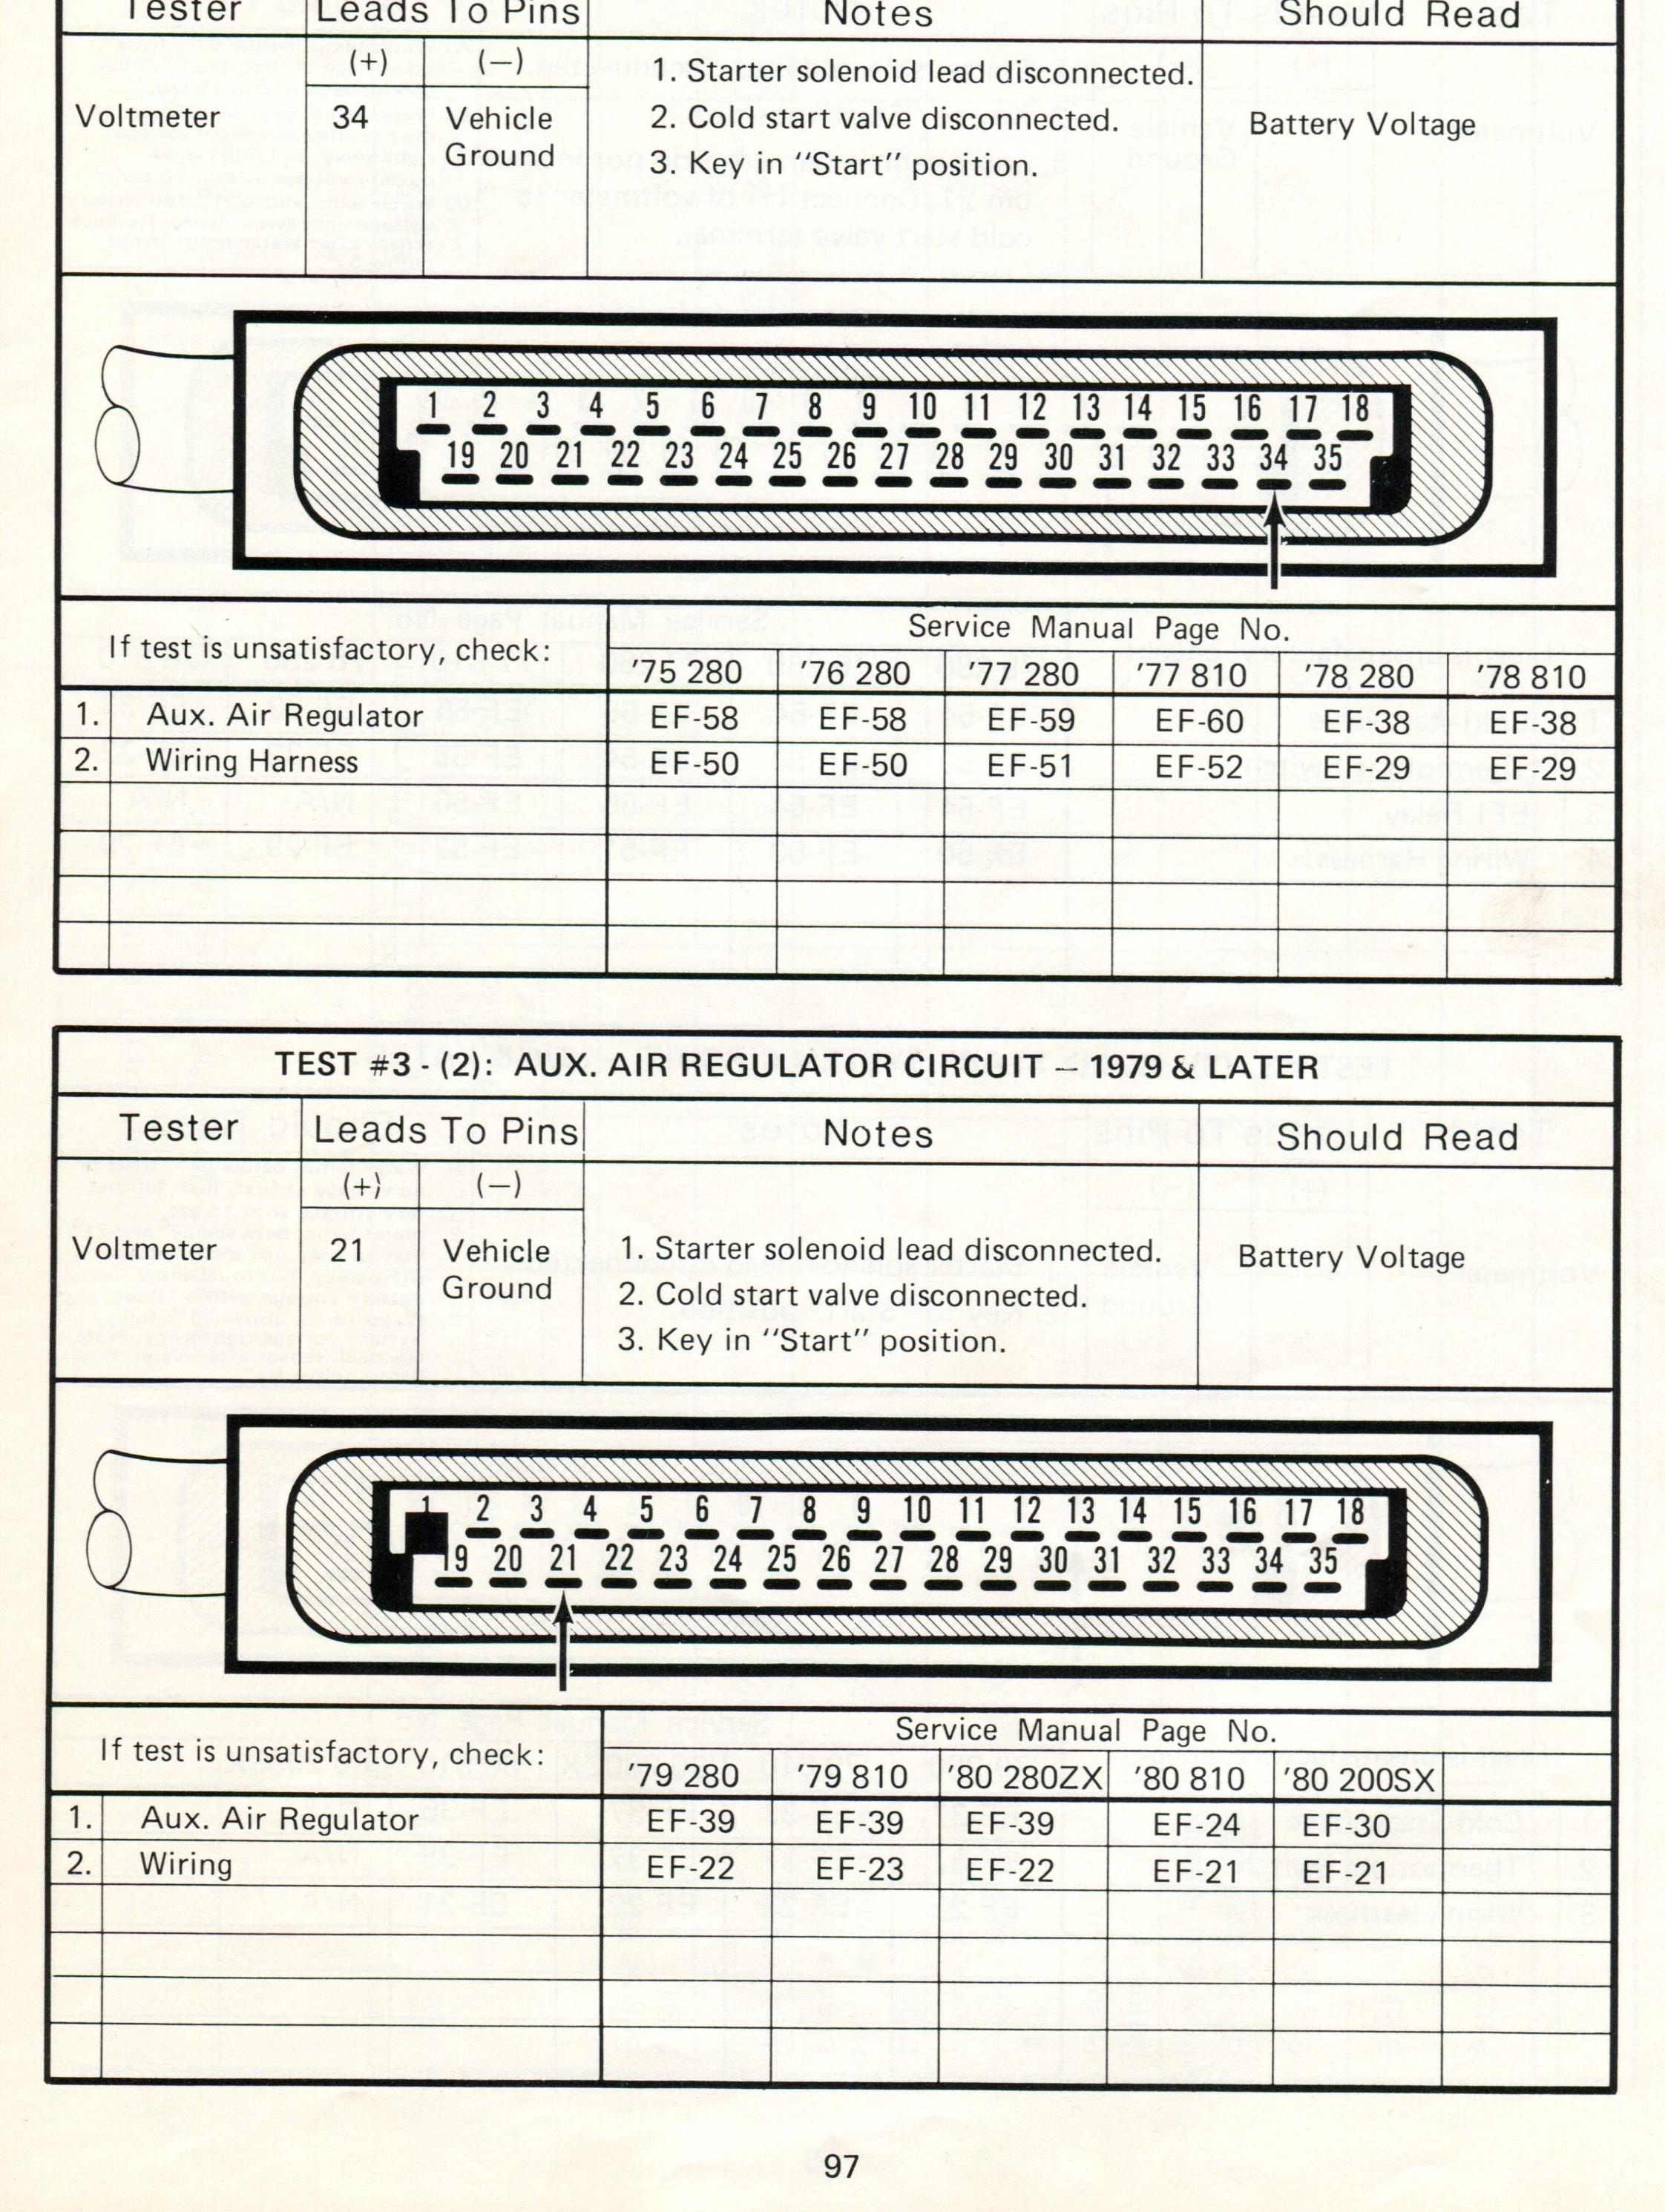 1978 280z Fuse Box All Kind Of Wiring Diagrams 1975 Diagram Datsun 1989 Buick Reatta Elsalvadorla Nissan